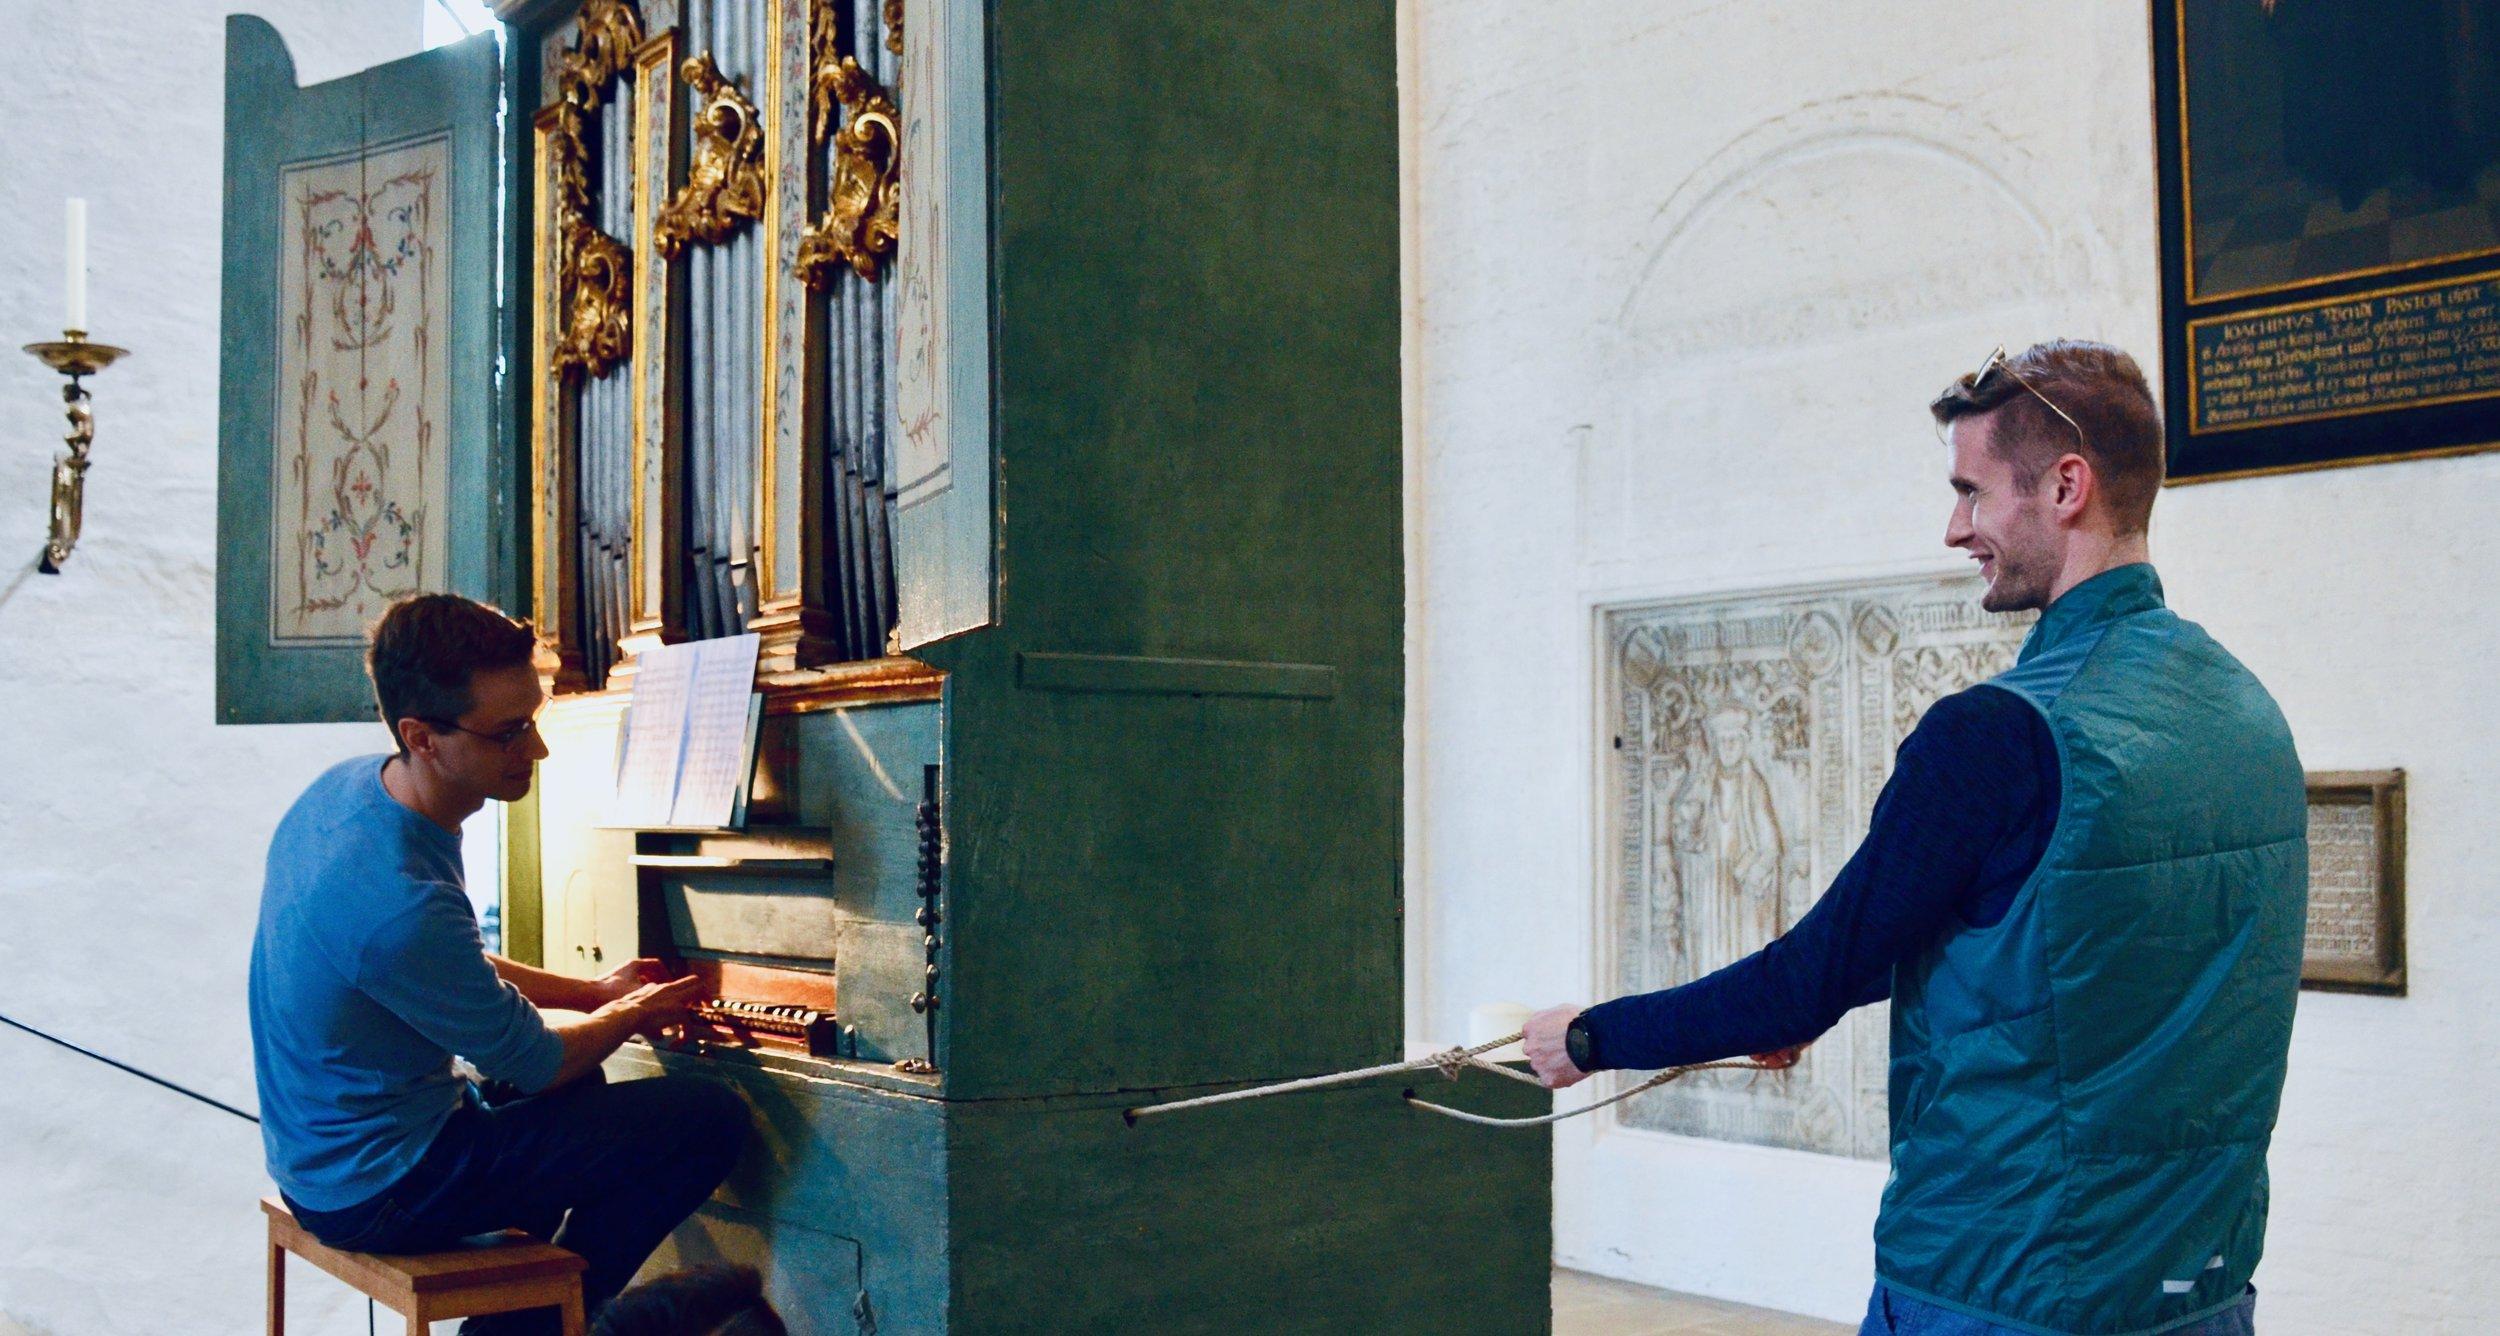 Alex Ross plays the 1777 Italian Baroque organ in Lübeck Dom.